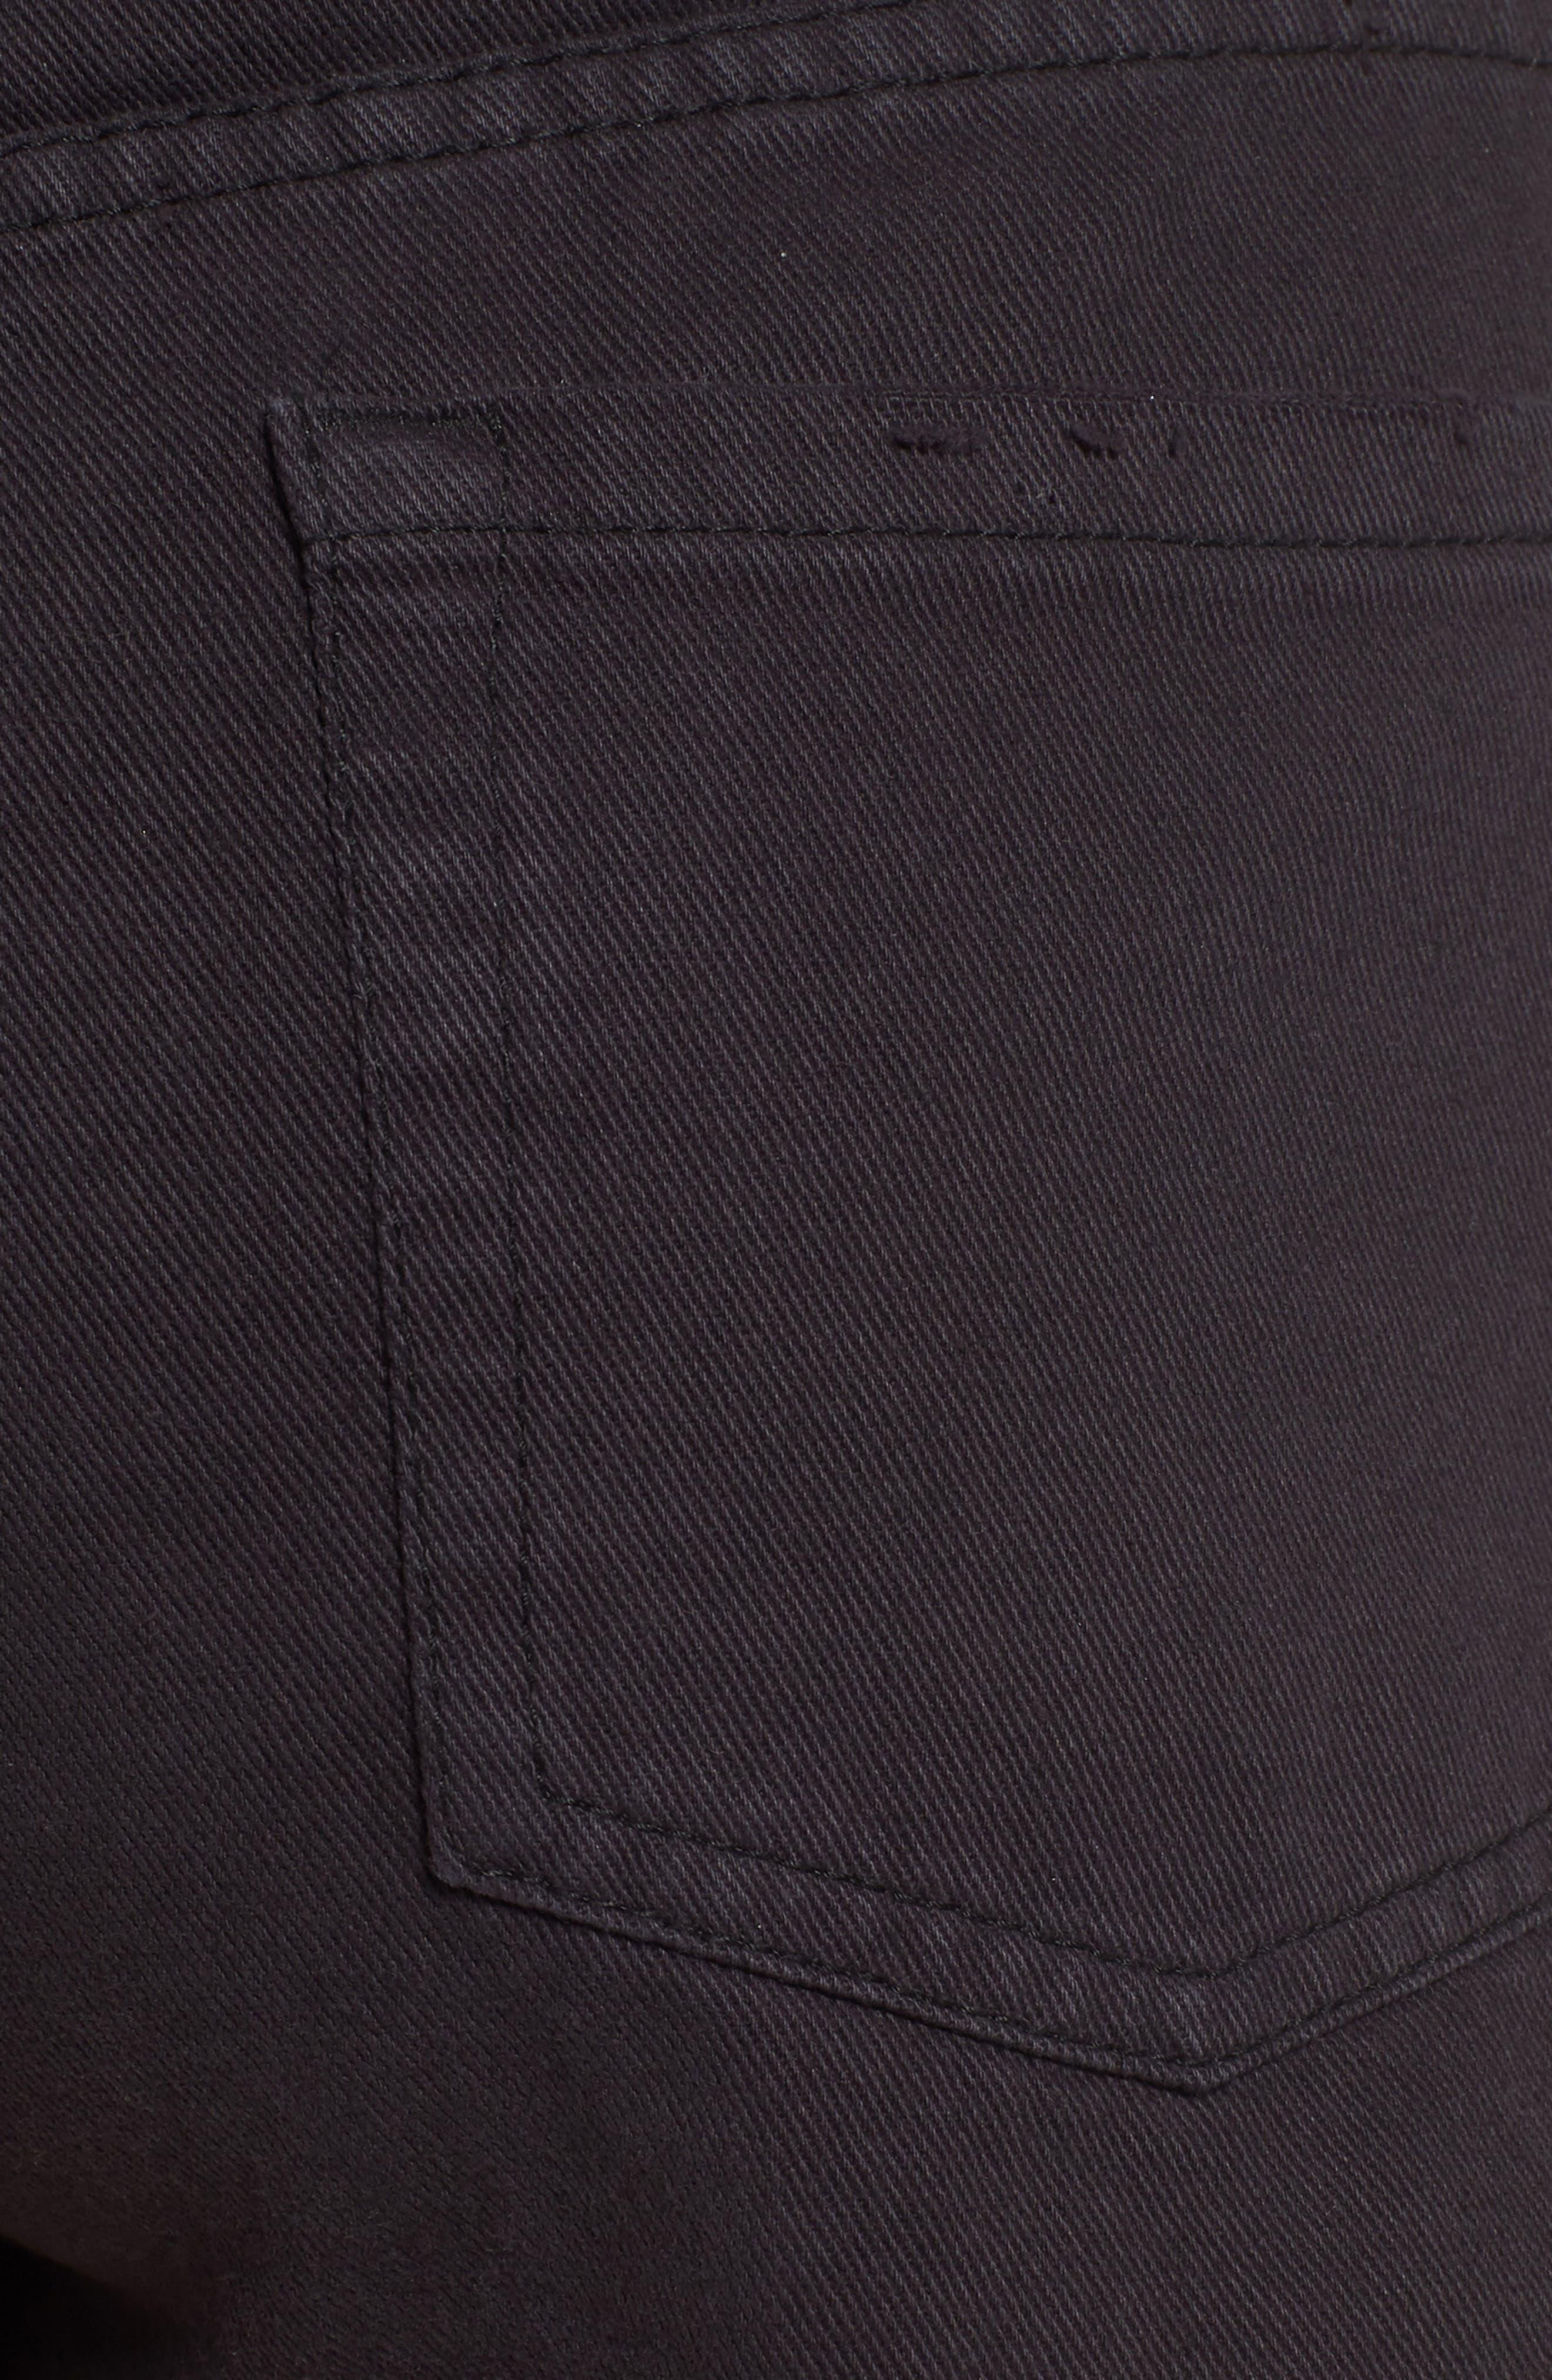 Shoreline Fray Hem Denim Shorts,                             Alternate thumbnail 6, color,                             001